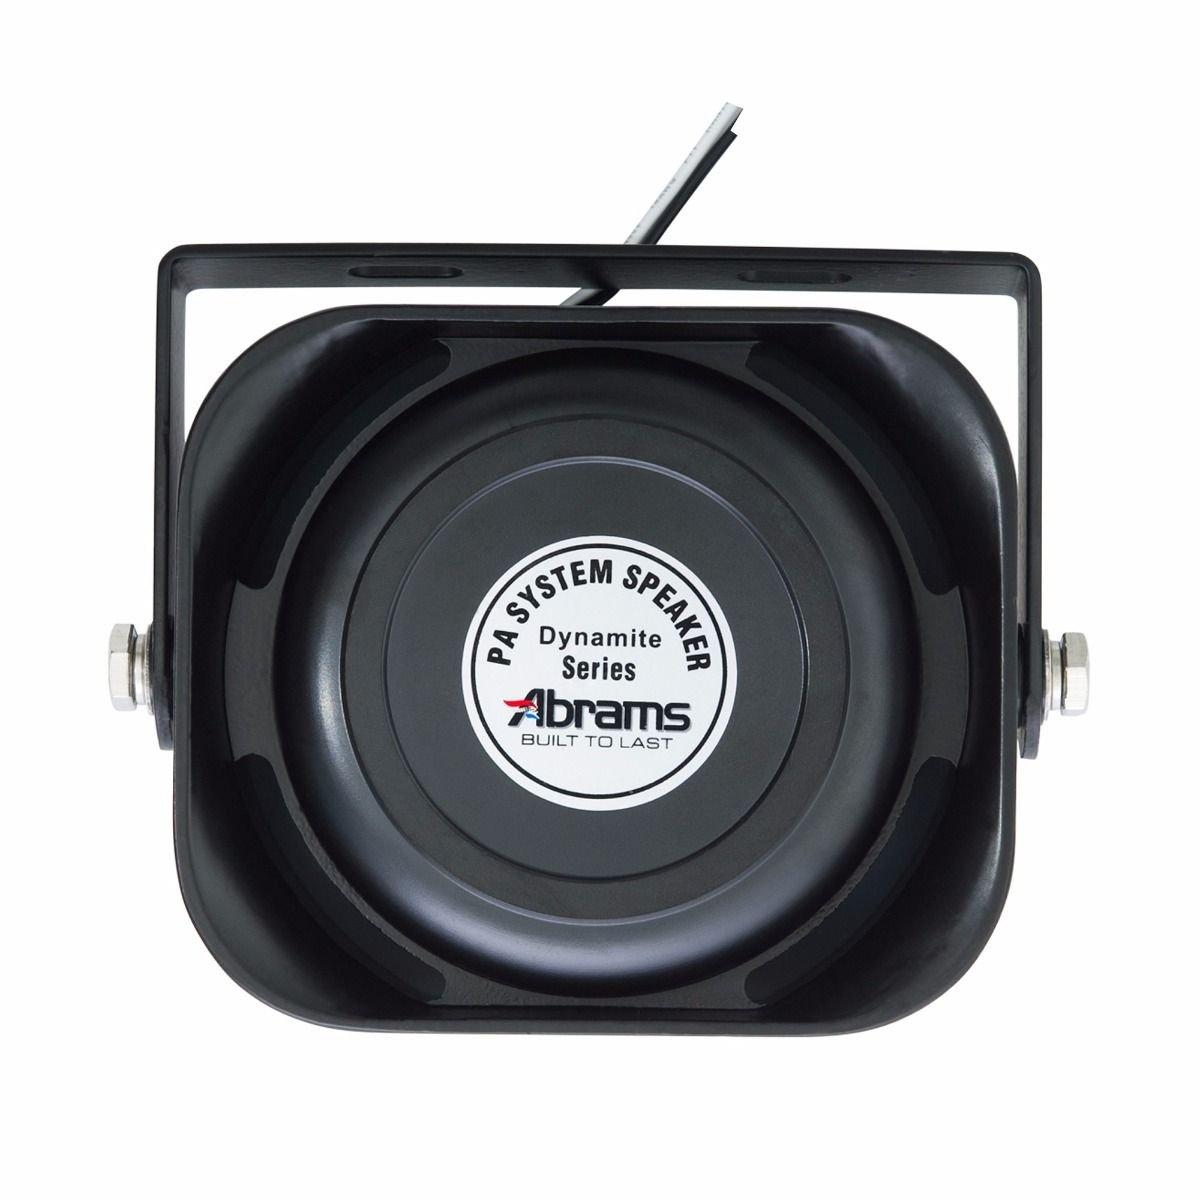 Abrams SLS-100 Slim Siren Speaker, 100W, 5.5'' Height, 2'' Length, 5.9'' Width by Abrams (Image #2)